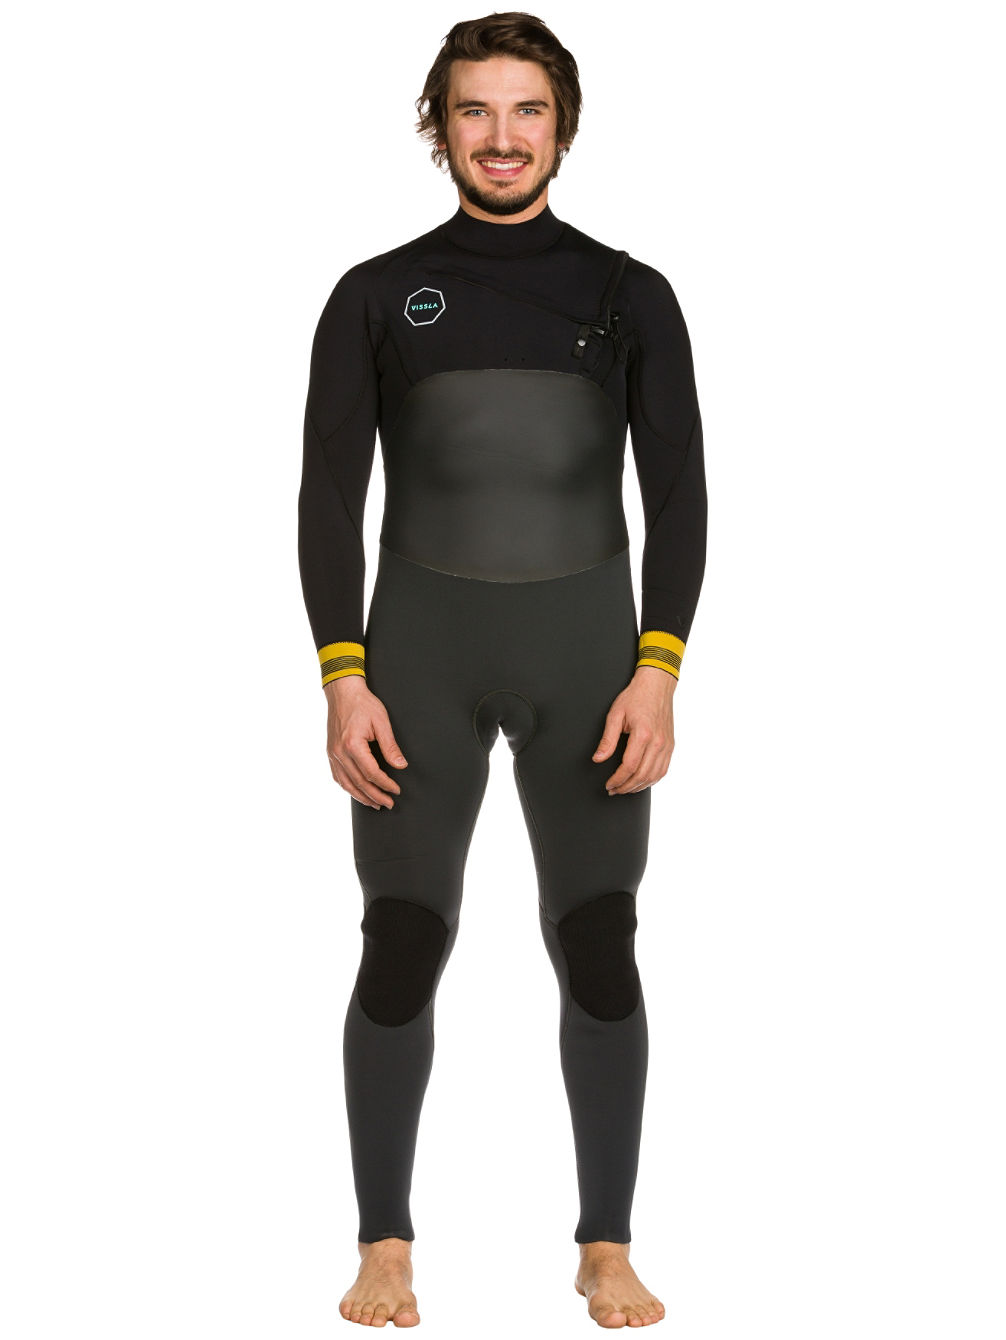 vissla-seven-seas-32-full-50-50-wetsuit